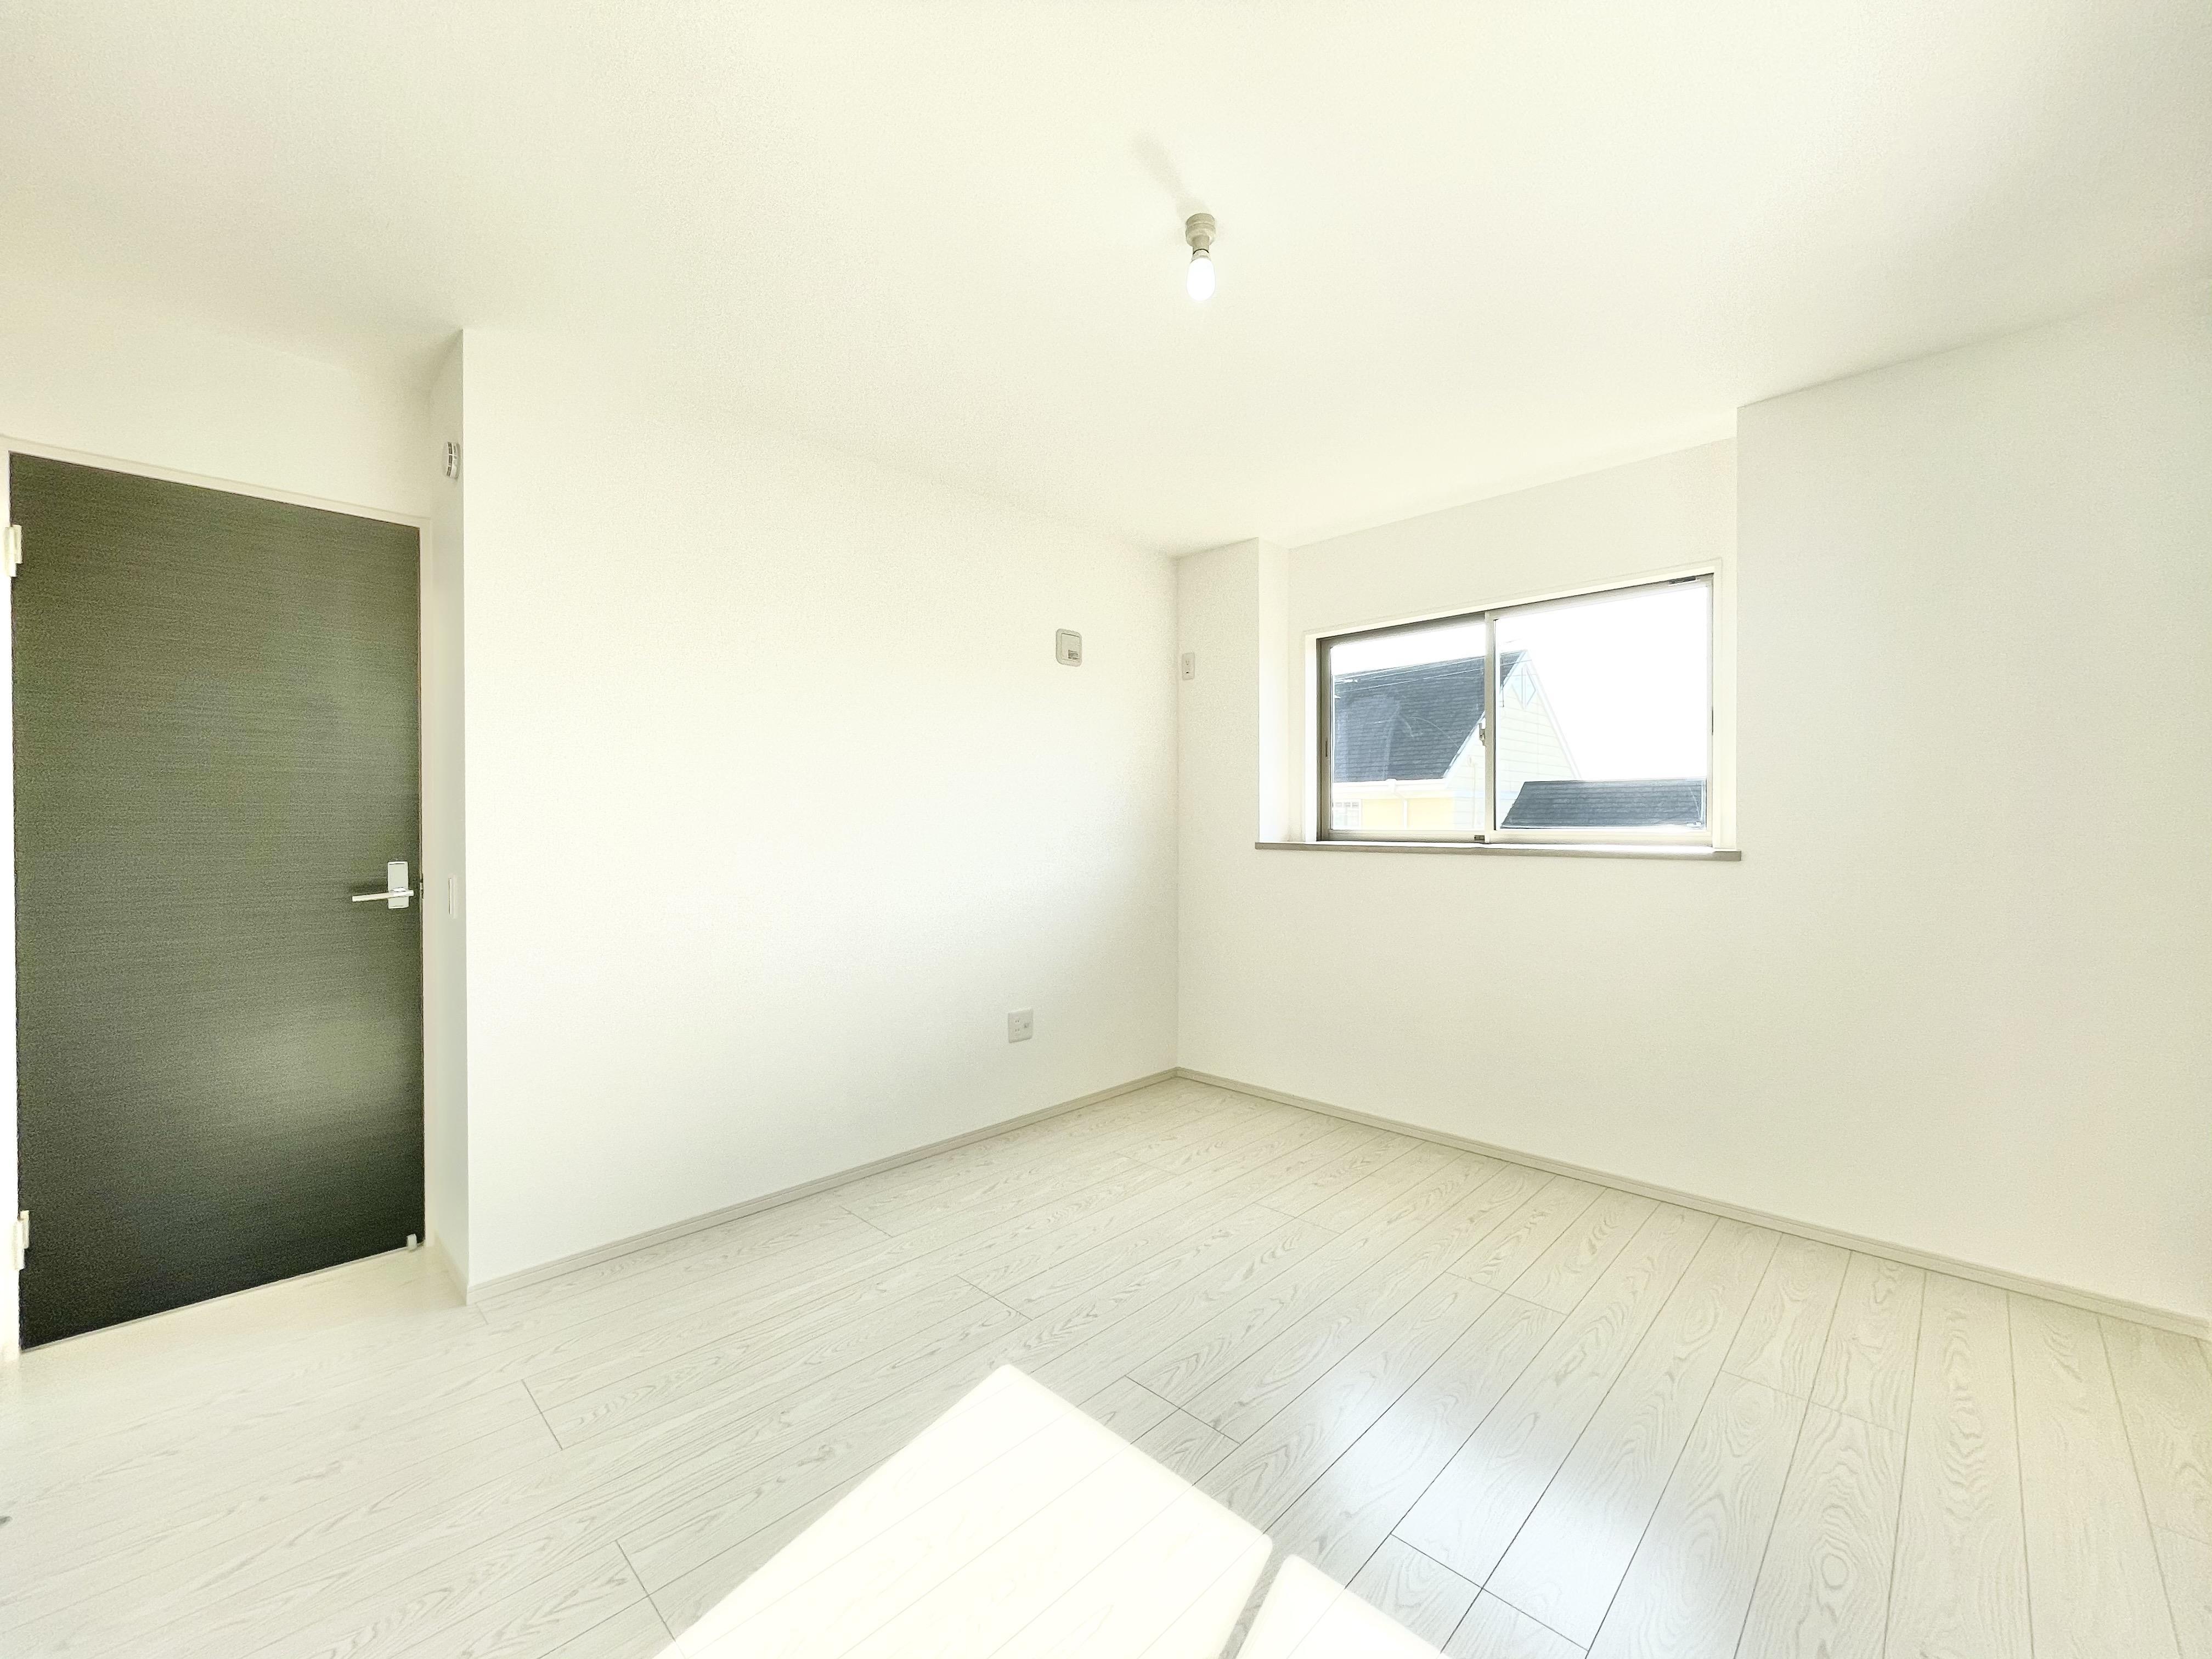 2F洋室が間仕切り対応可能な間取り。お子様が小さいうちは1つの大きなお部屋として使い、成長の過程で壁を付けてお部屋を2つに分けて使うことができます。